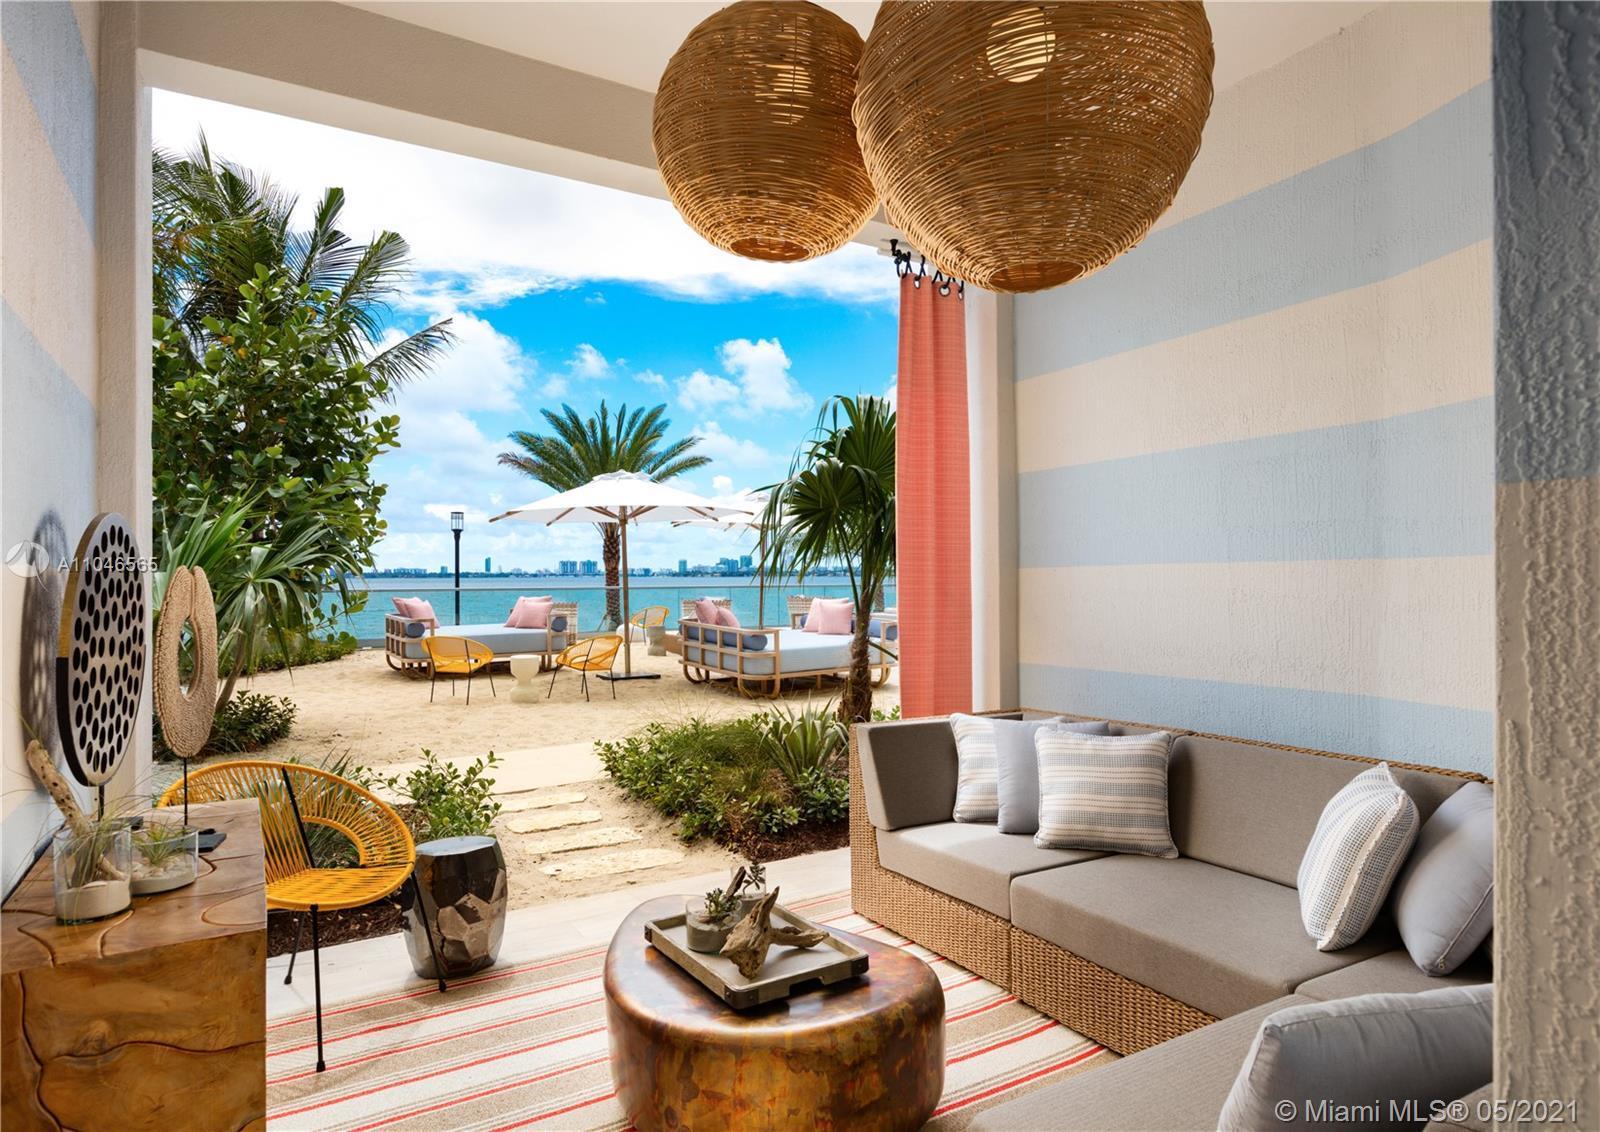 Sensational 2 beds 2 baths at the glamorous Biscayne Beach Condo. Unit has stunning bay views, moder